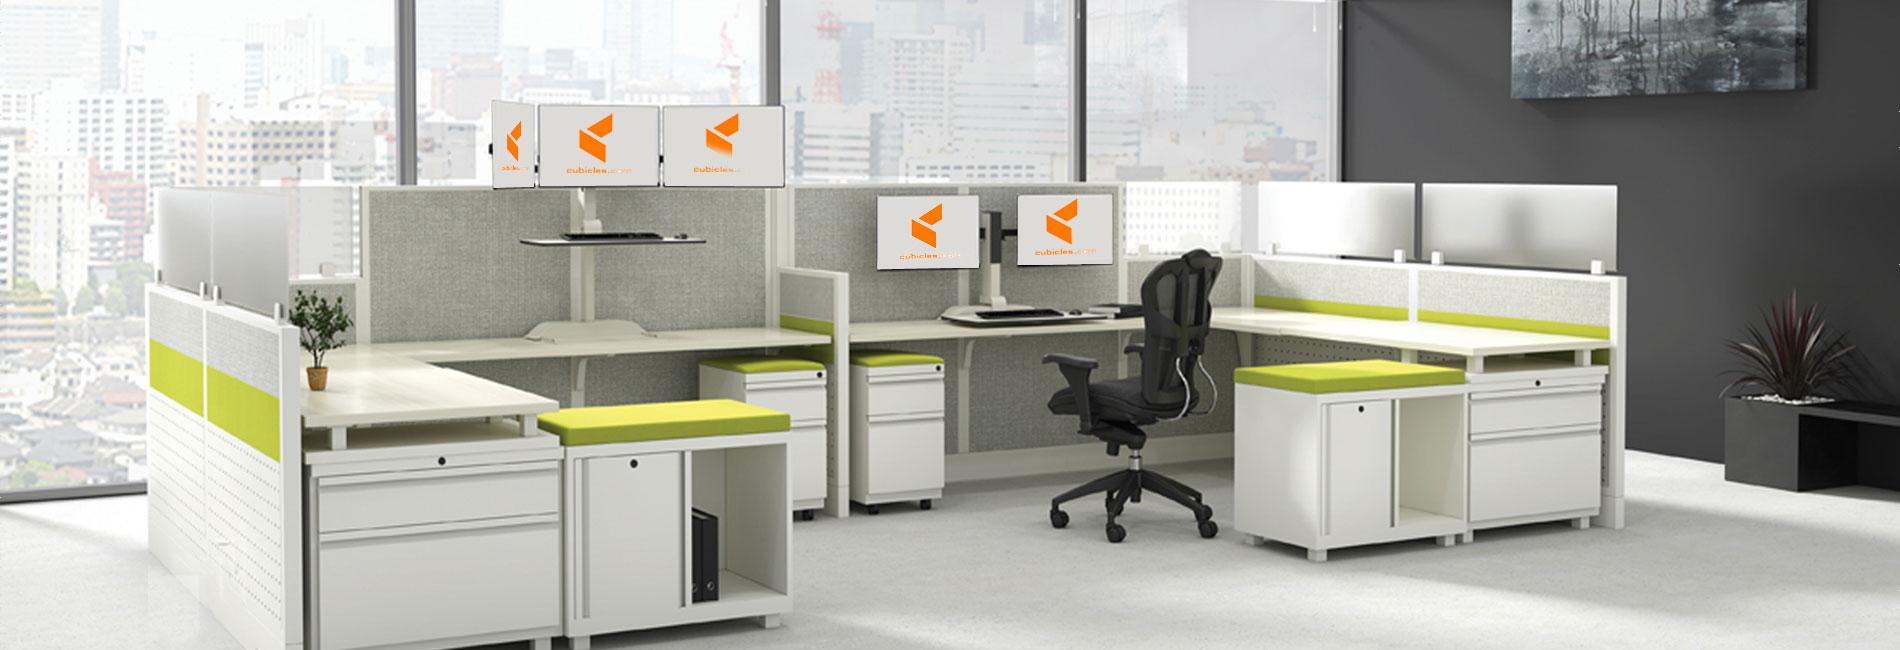 O2 Series Corporate Office Furniture